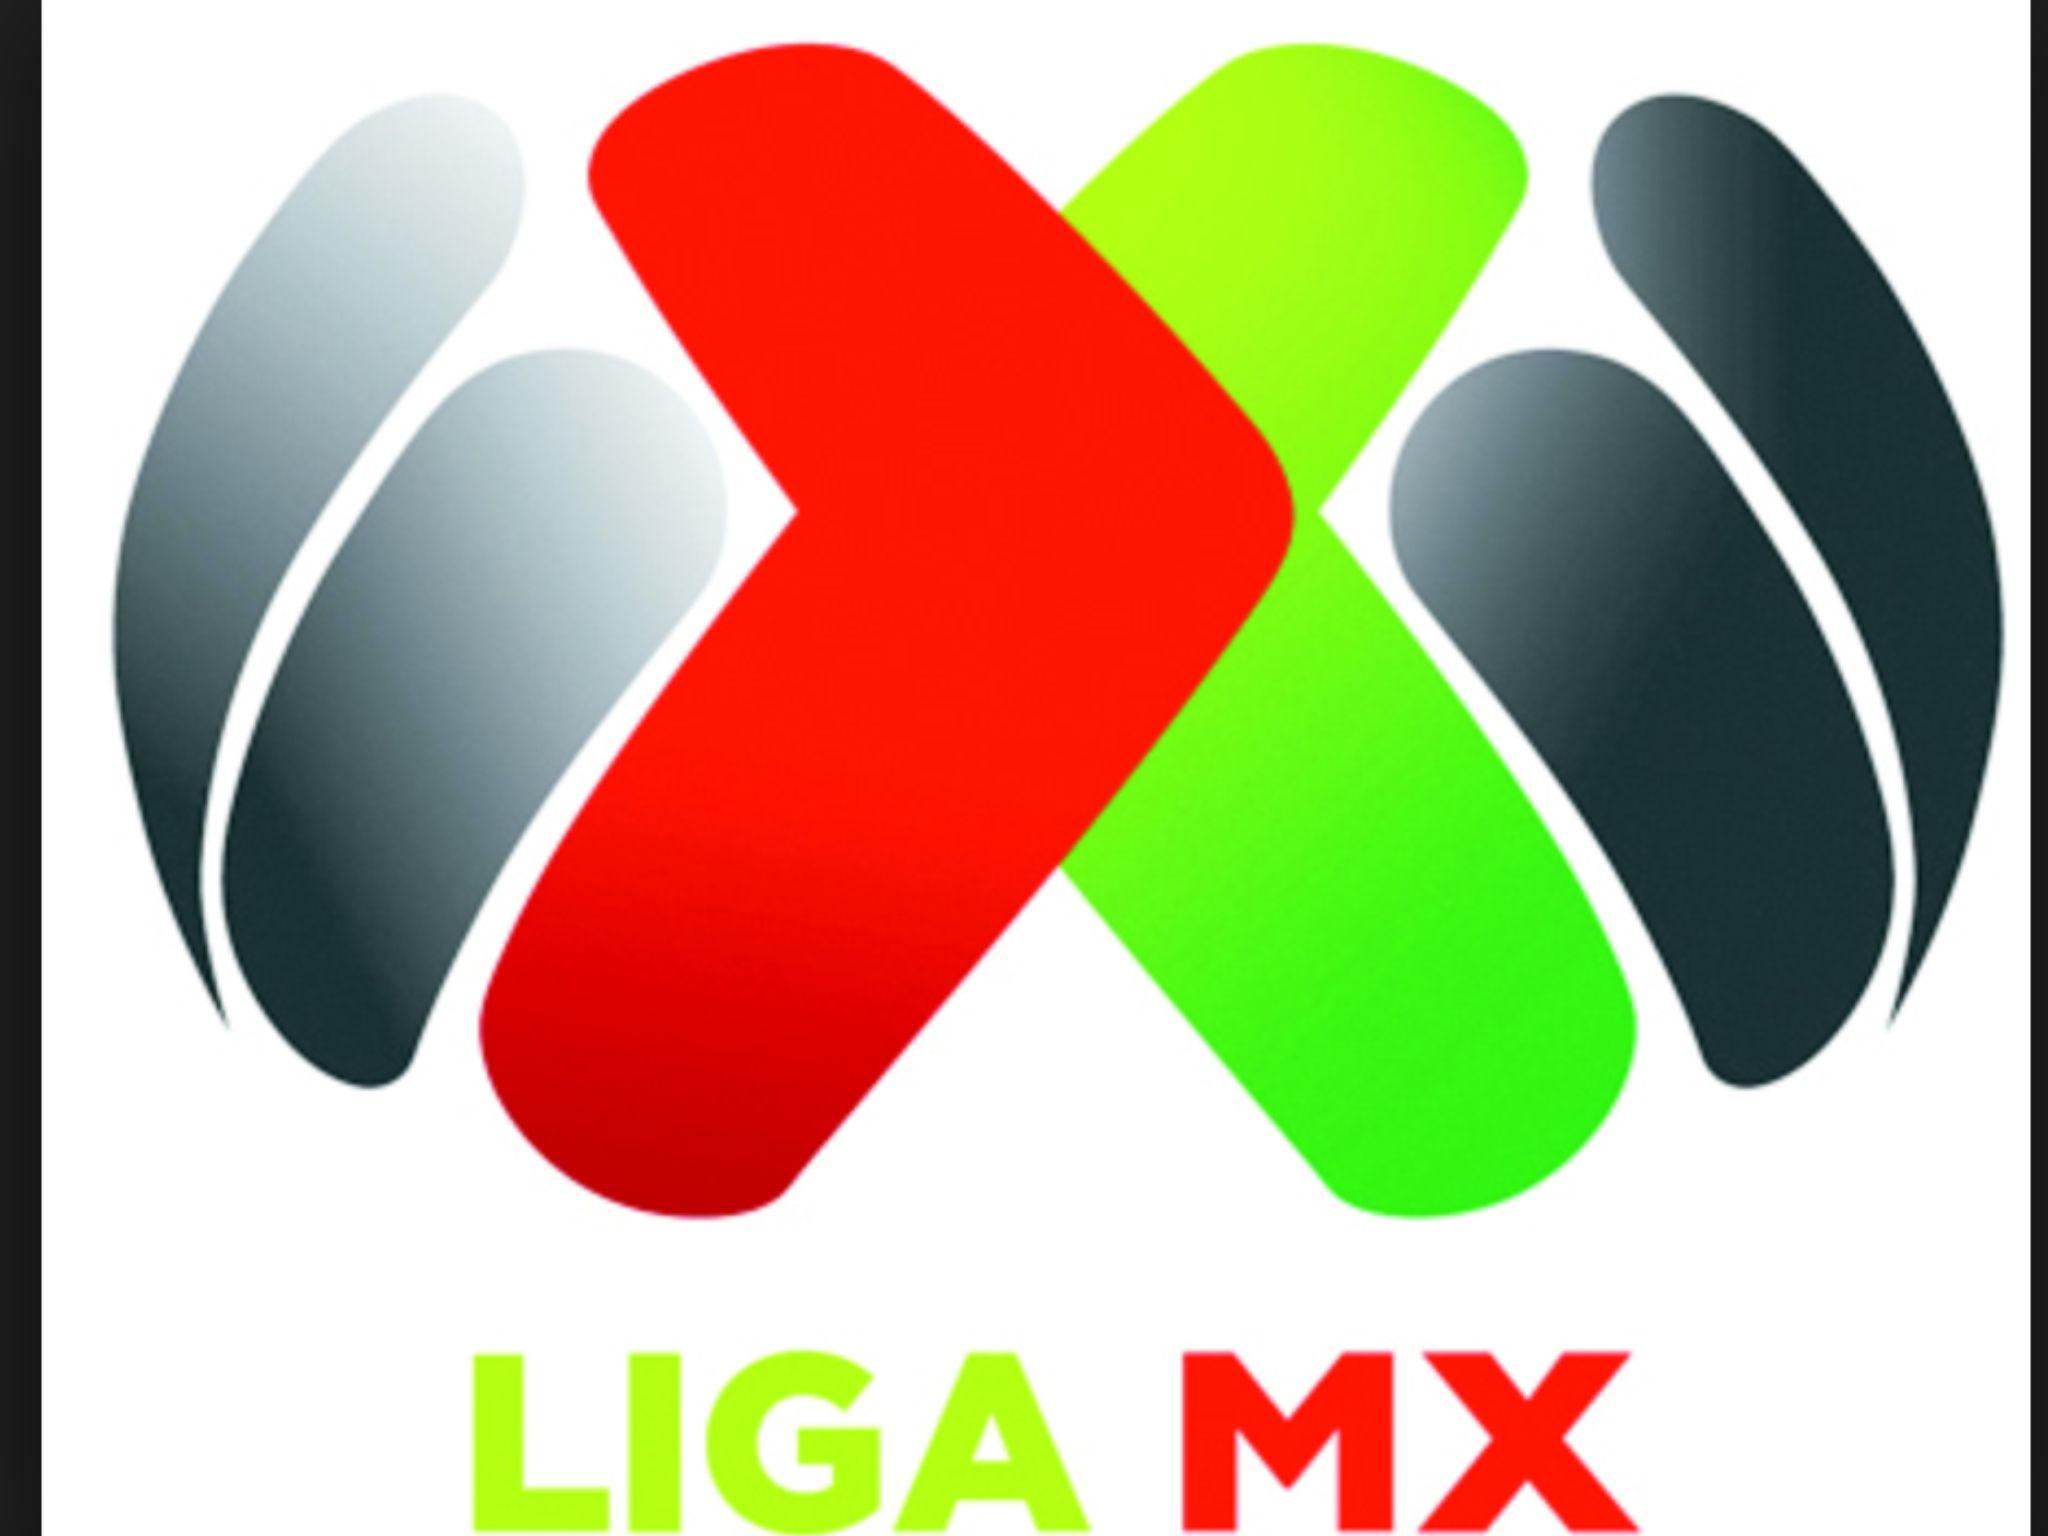 LIGA MX LOGO Liguilla Mx Equipo De Mexico Torneos De Futbol